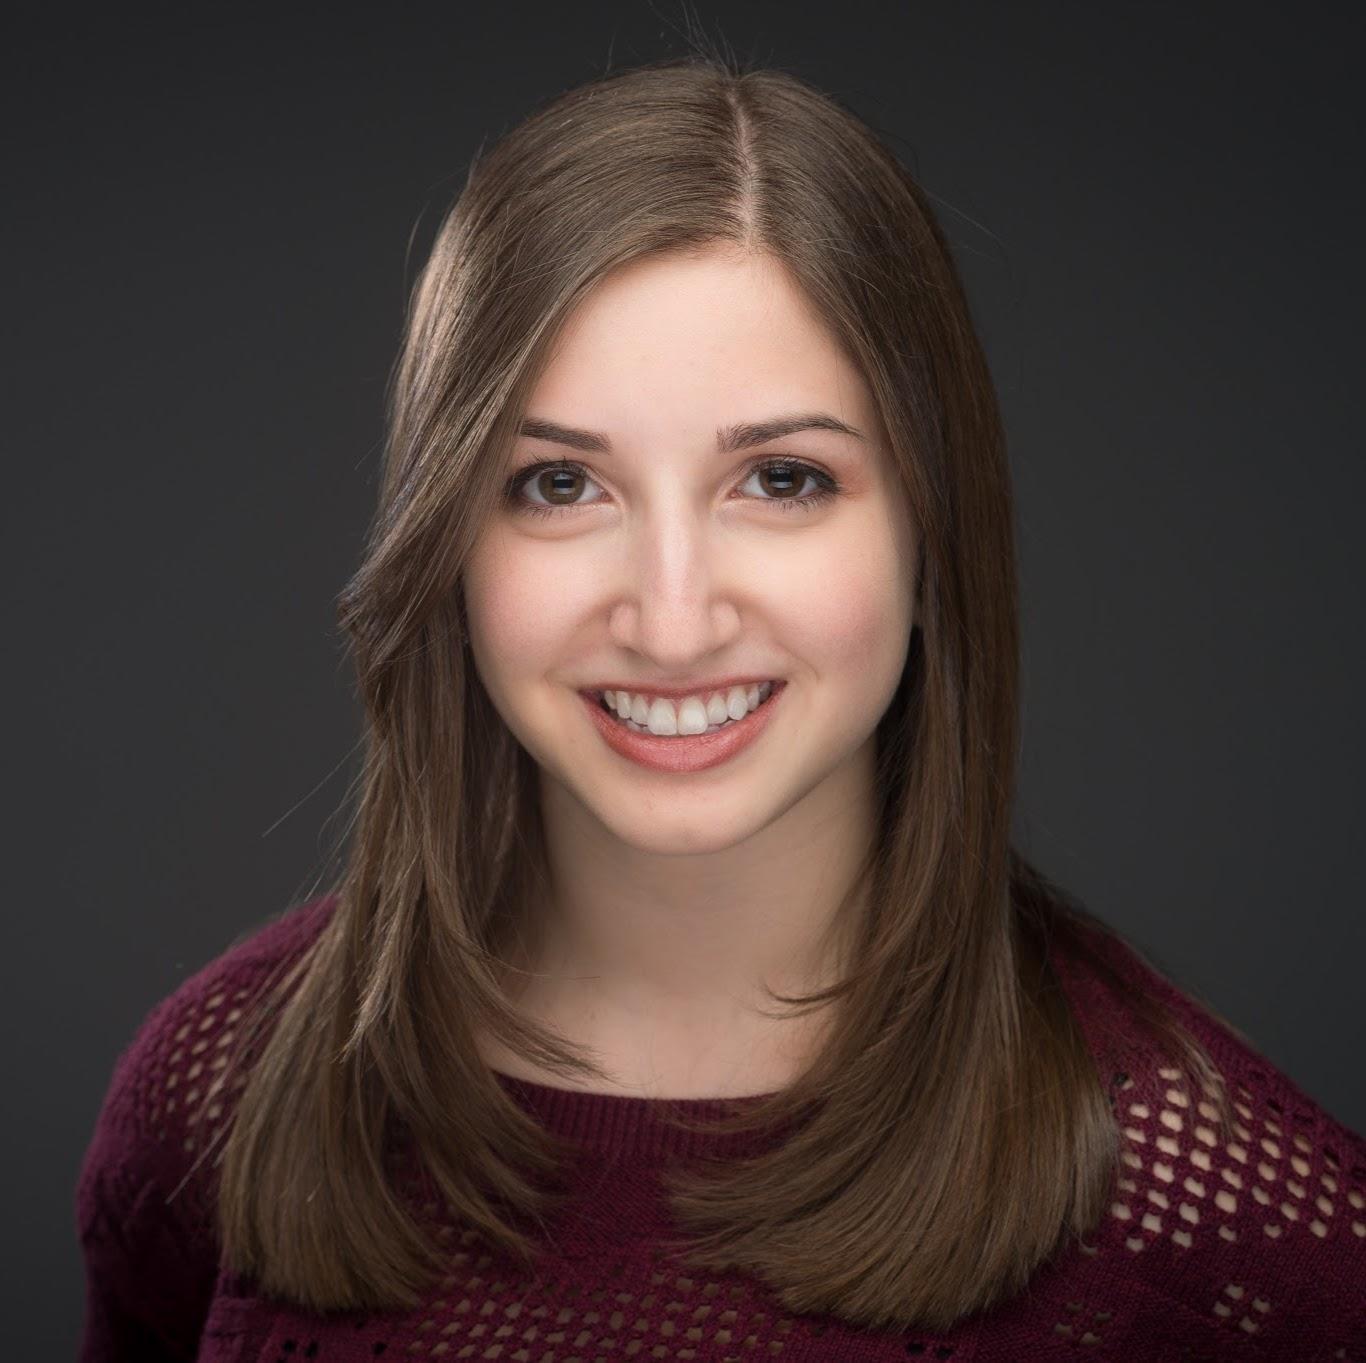 Brianna Gitnik - Instructor